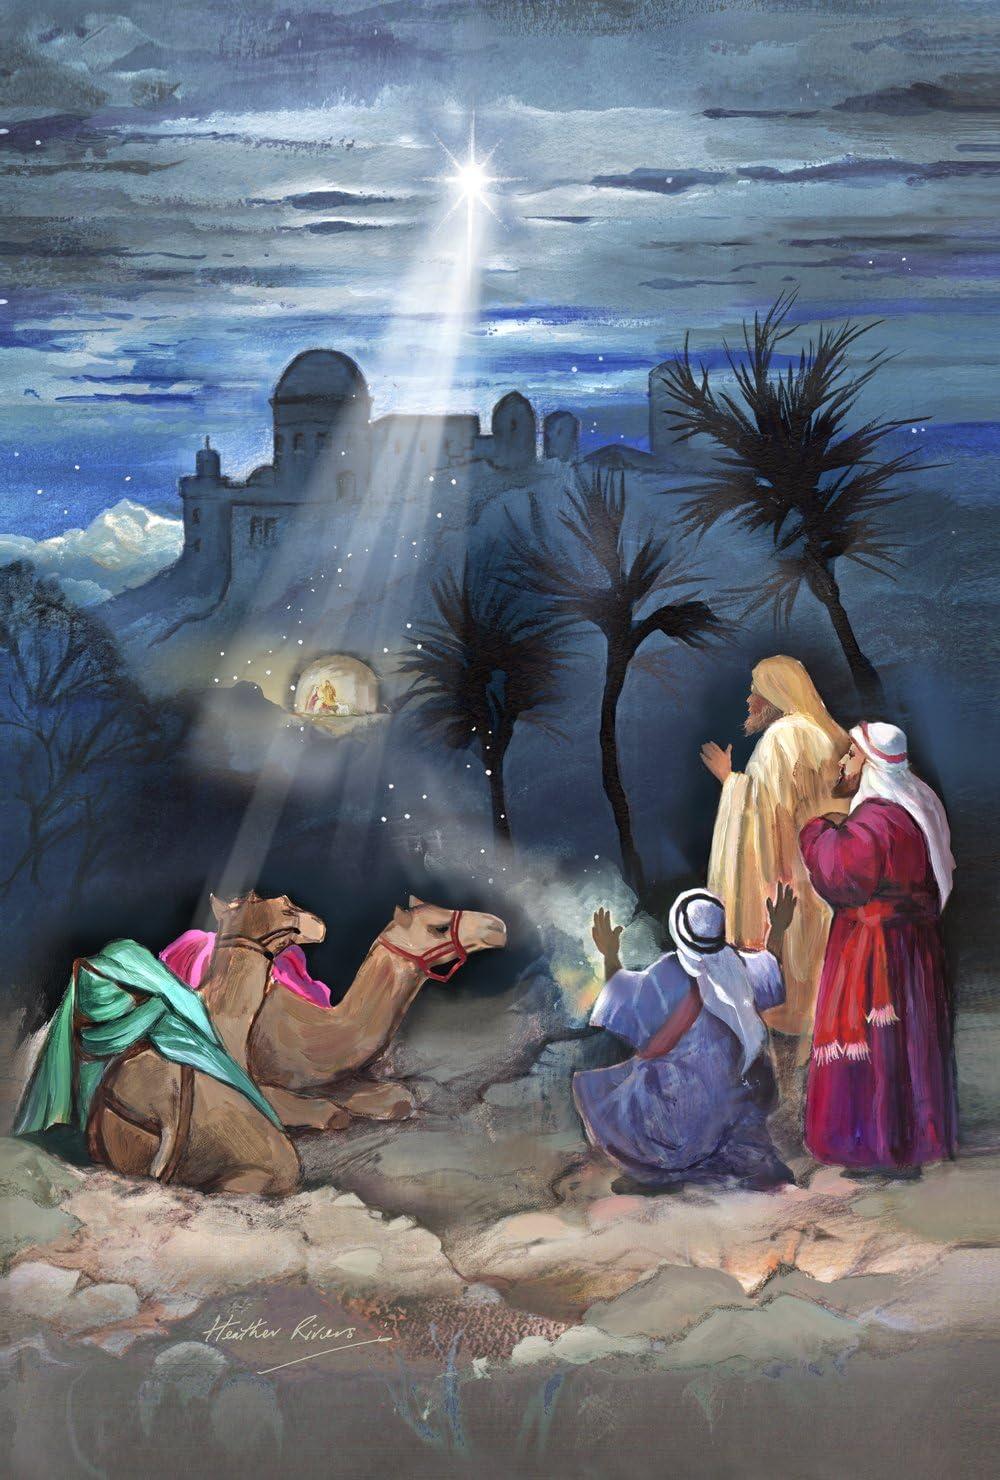 Toland Home Garden Star of Bethlehem 12.5 x 18 Inch Decorative Christmas Jesus Birth Wise Men Garden Flag - 119723, White/Gray/Brown/Green/Blue/Red